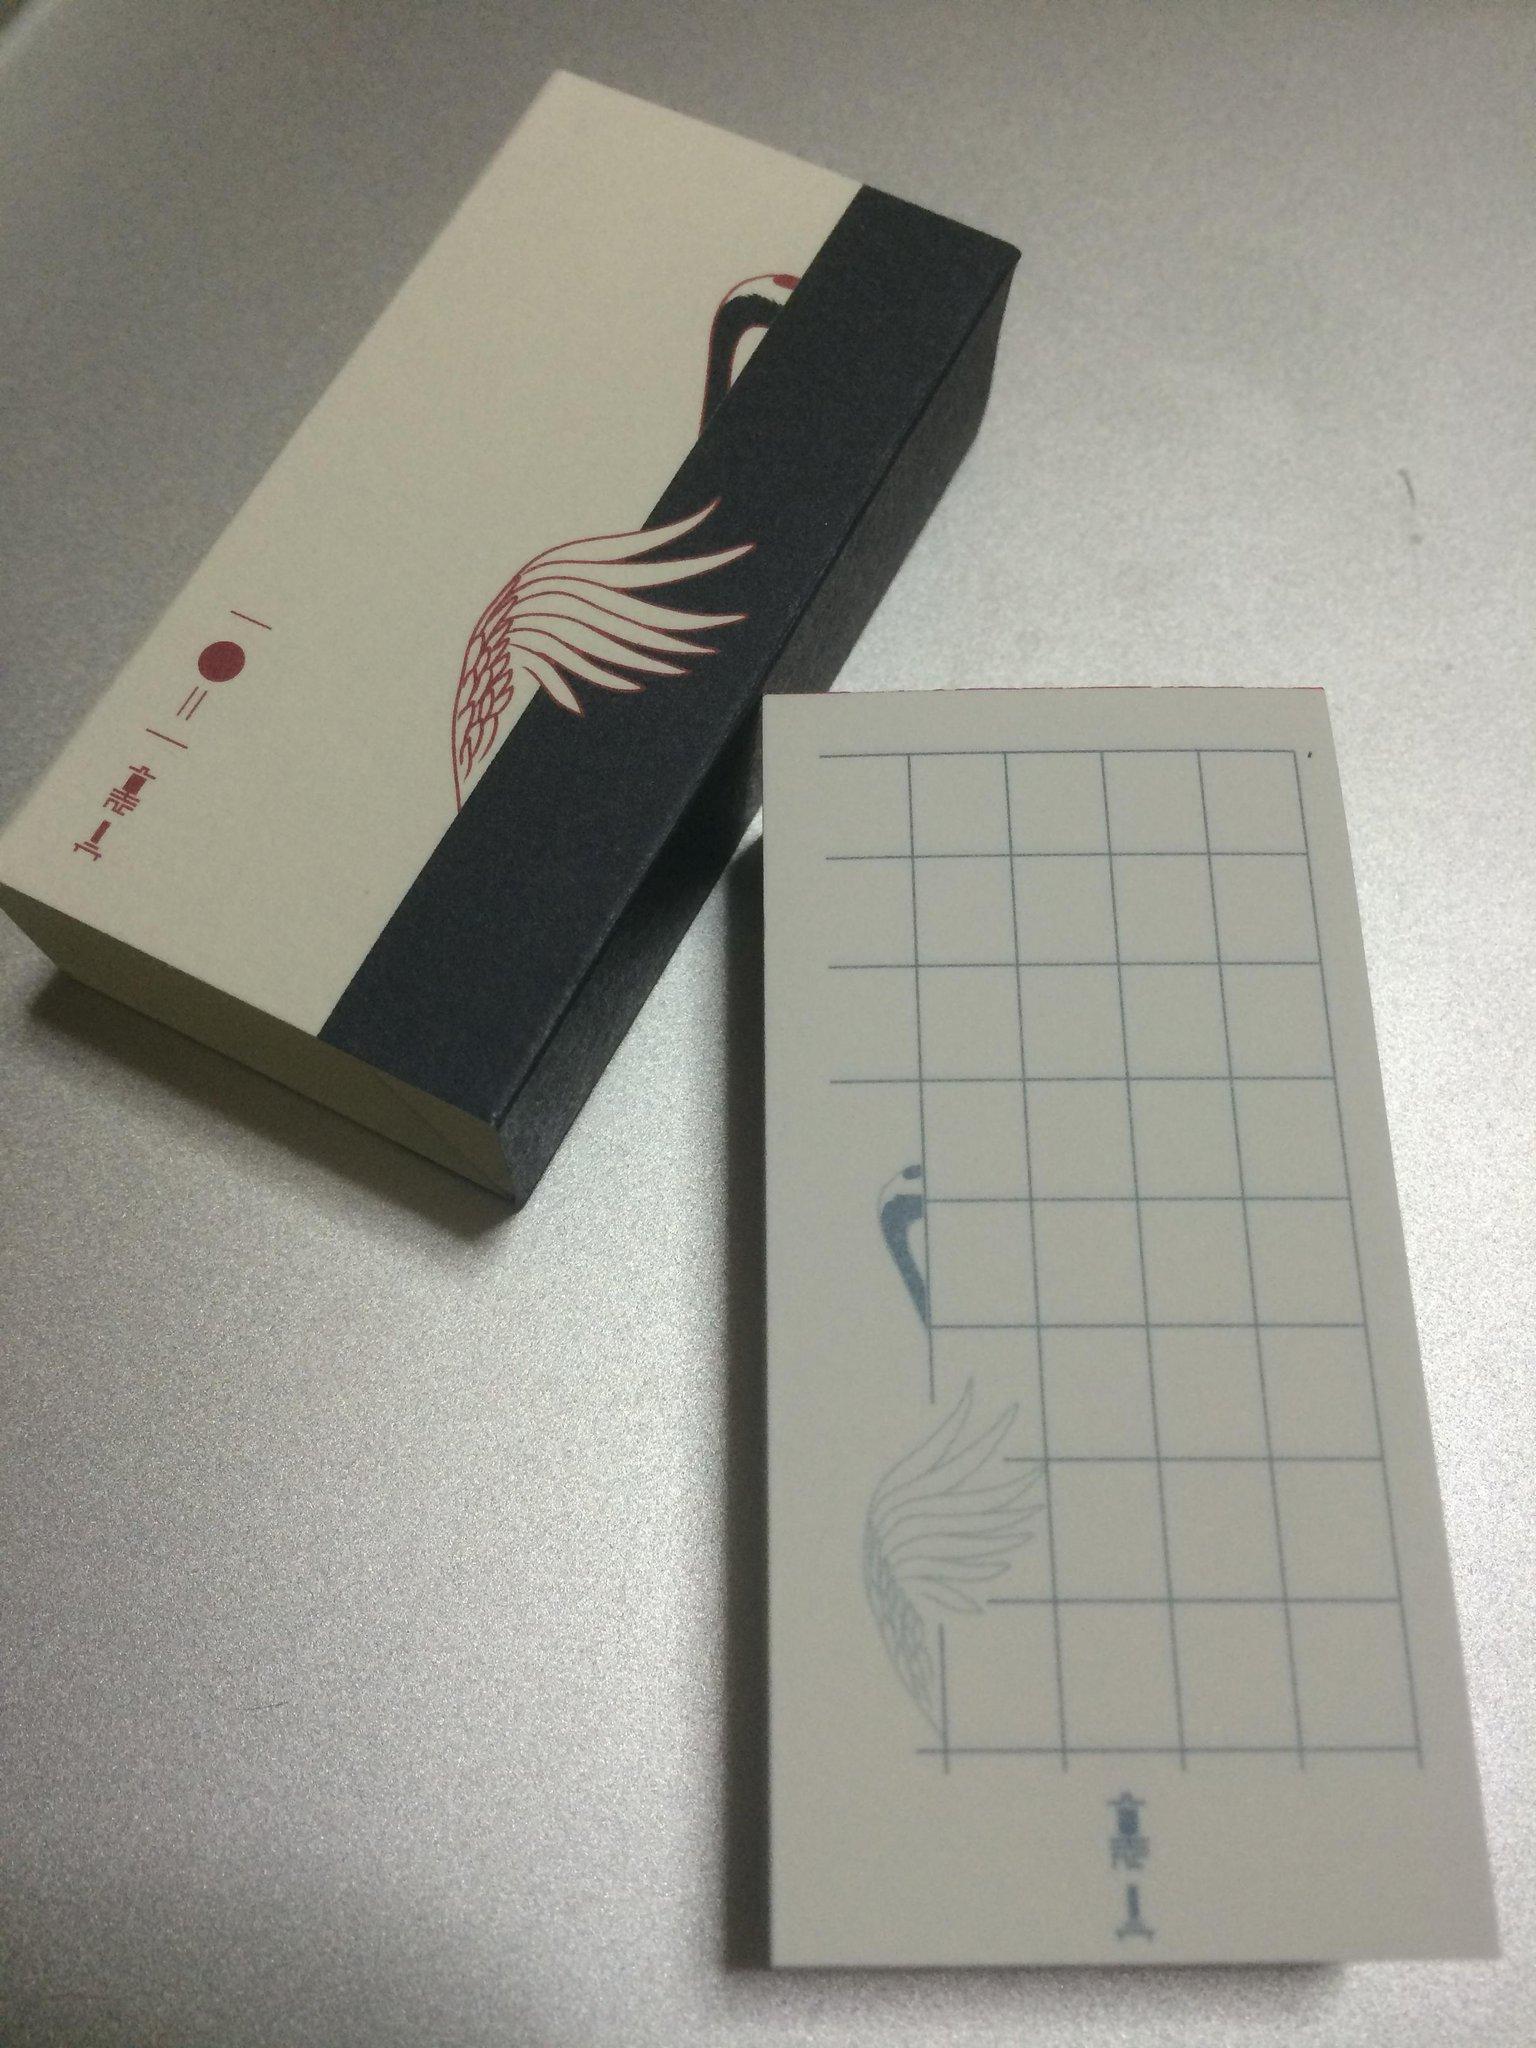 RT @ayawatako: 裏具のまめも。明日から「さそう鶴亀」使わせていただきます http://t.co/5ZzhXFcWIz